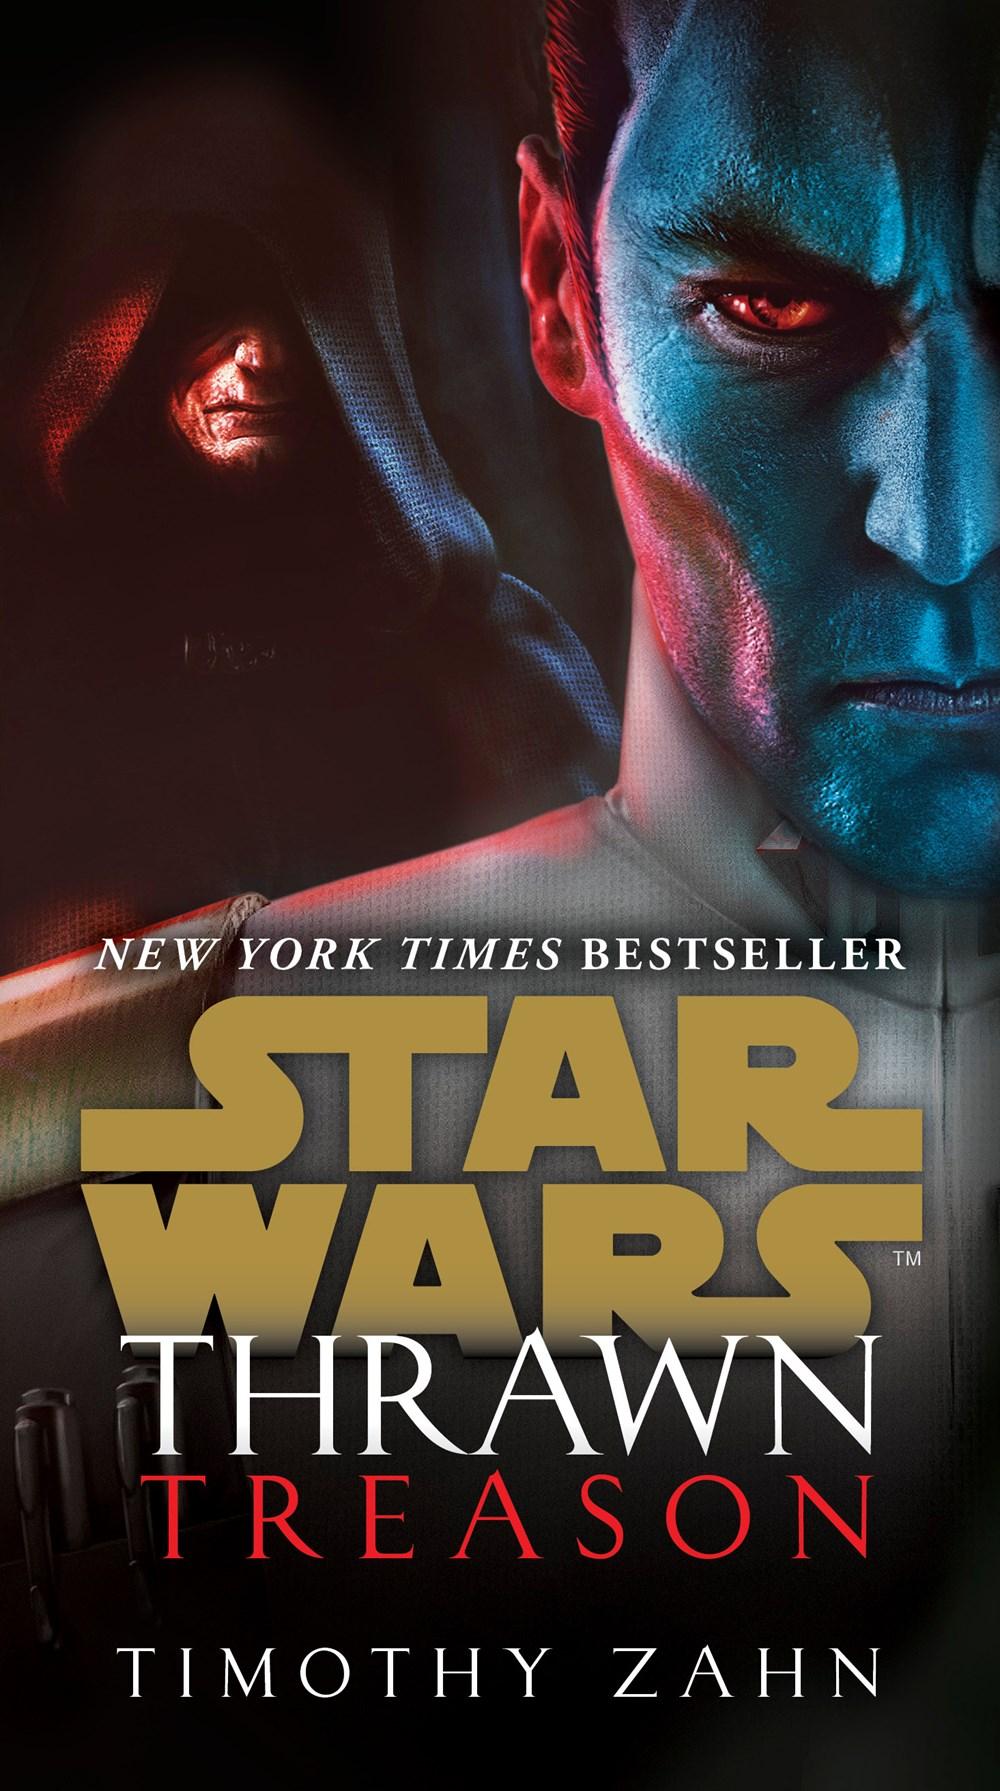 Thrawn: Treason (31.03.2020)